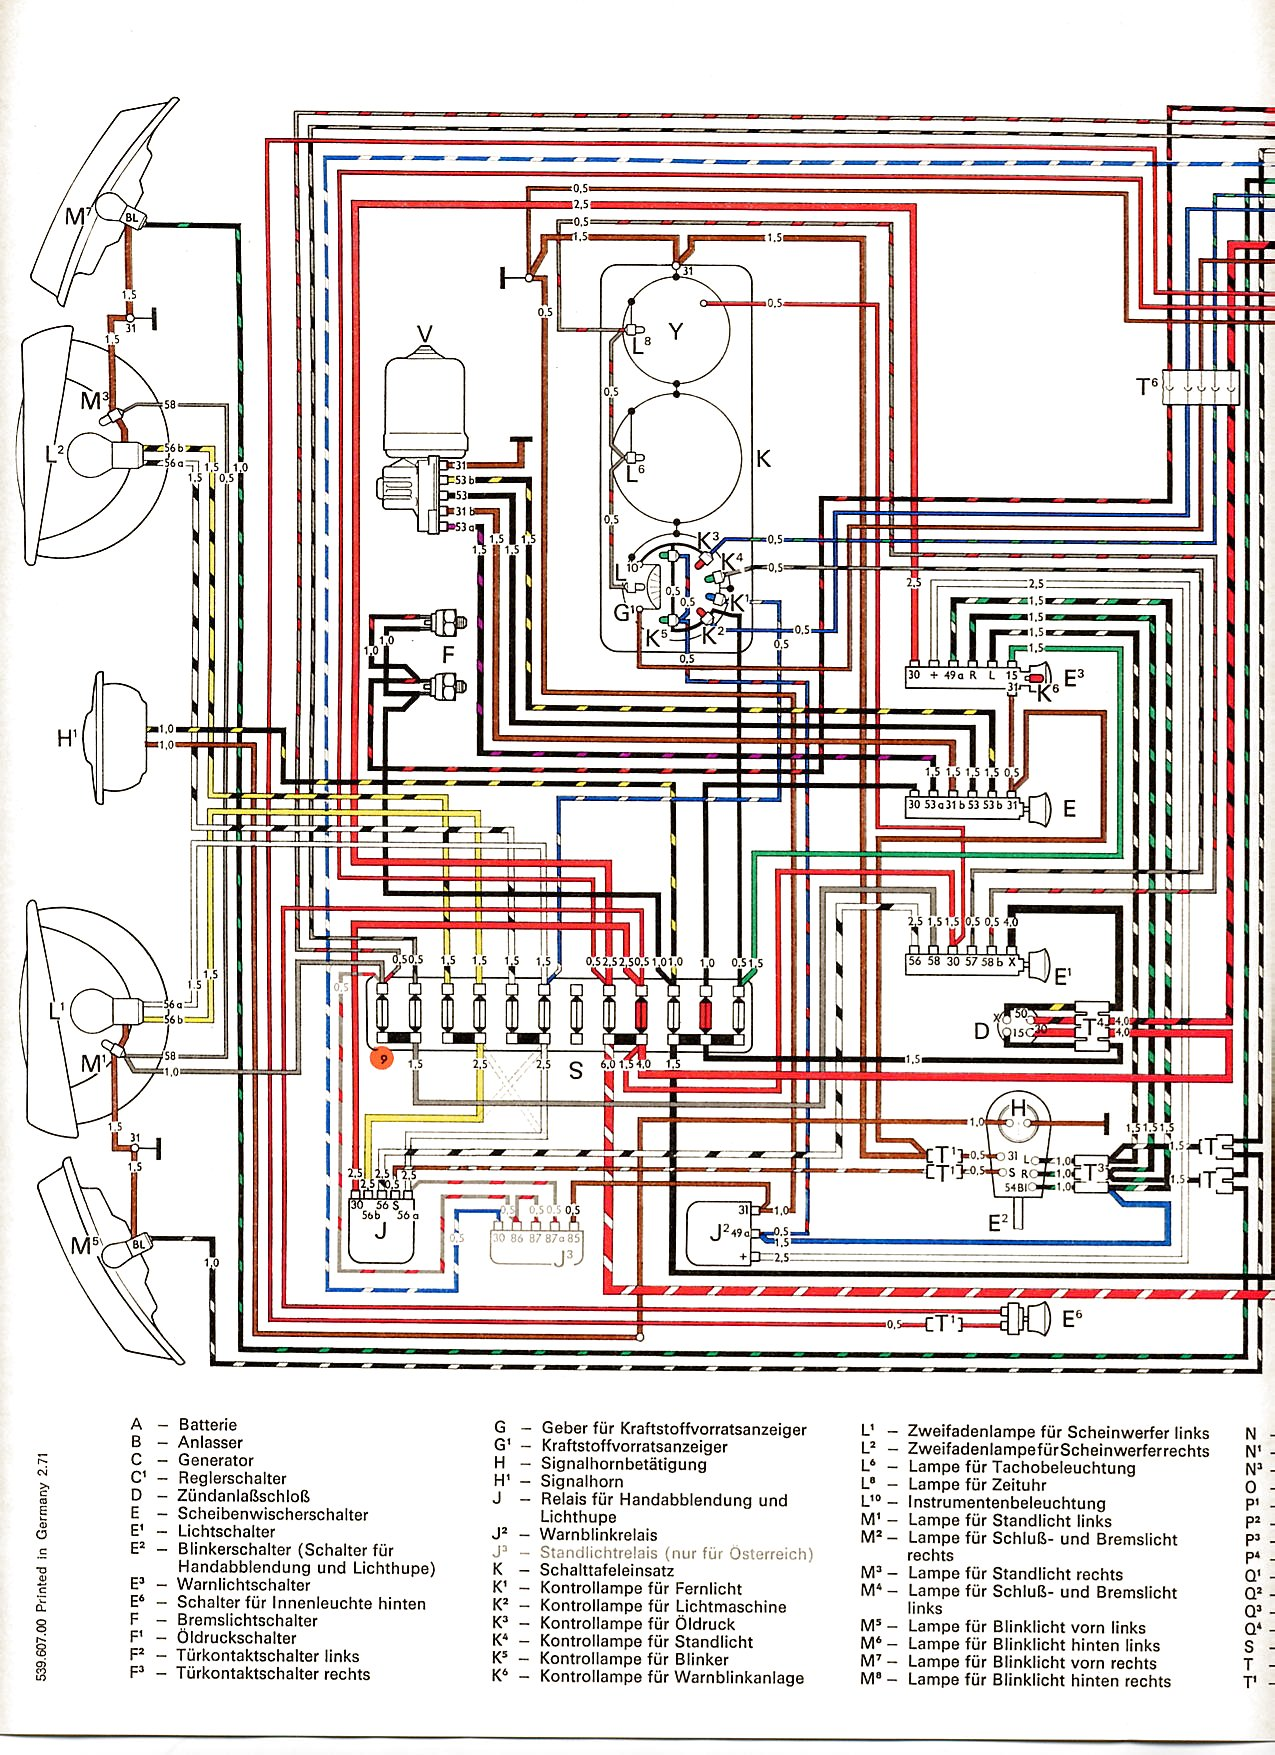 Vw Transporter Fuse Box Layout 2013 : Volkswagen transporter t fuse box diagram